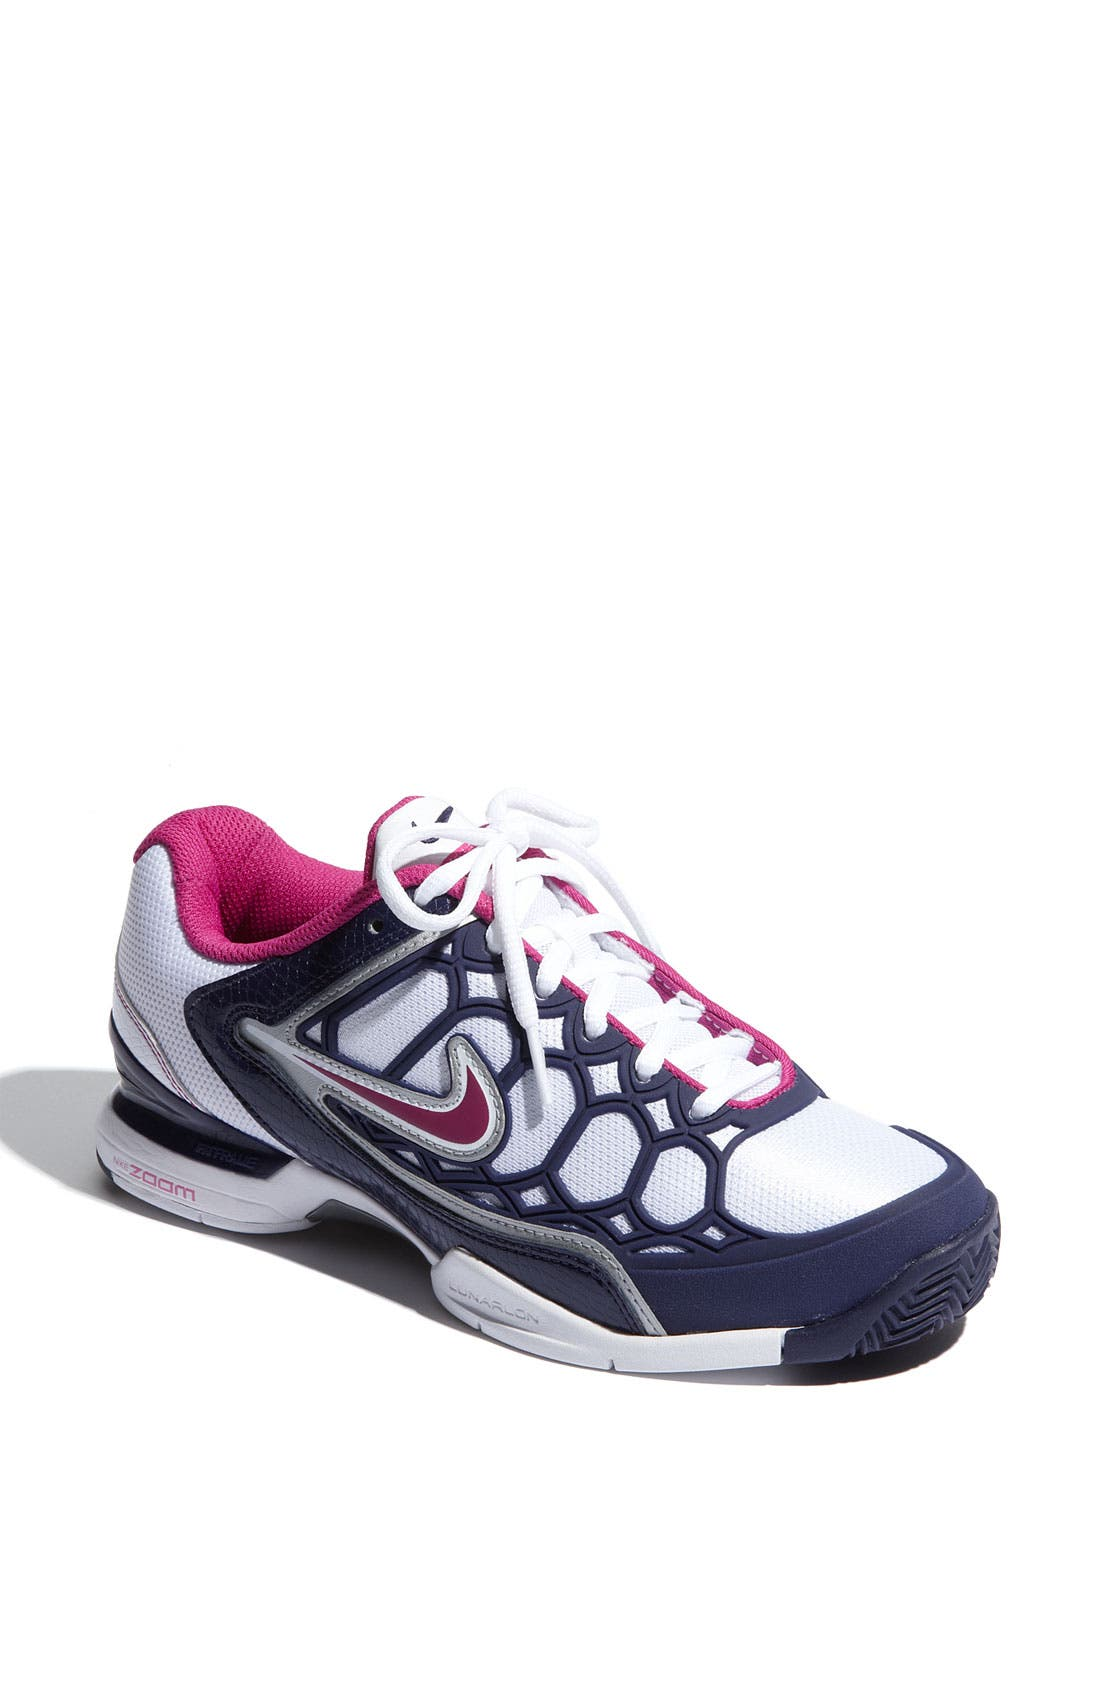 Alternate Image 1 Selected - Nike 'Zoom Breathe 2' Tennis Shoe (Women)